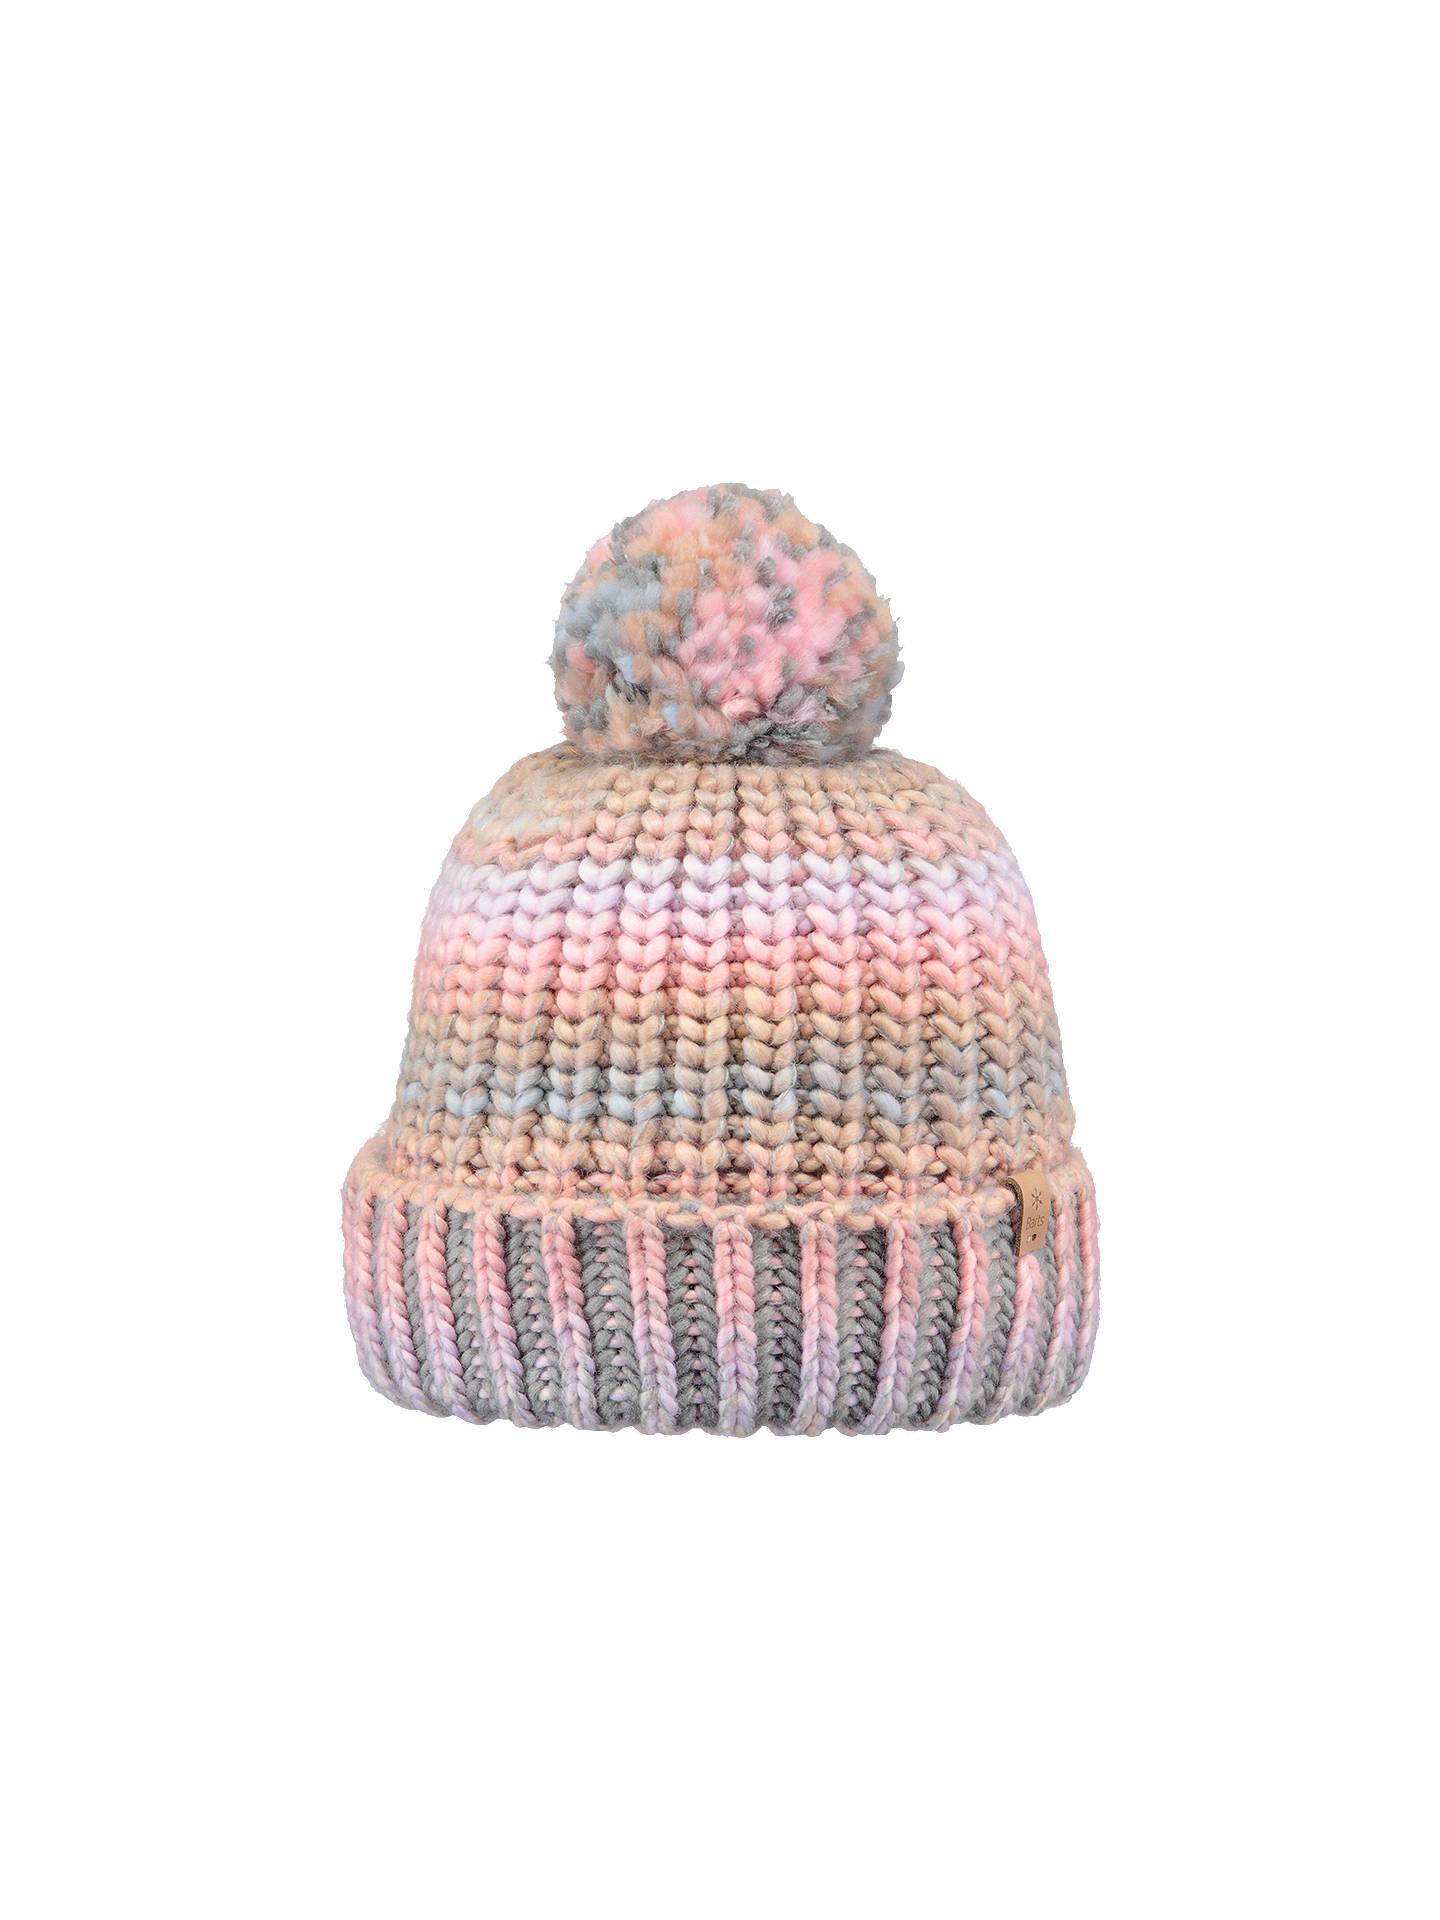 37b73cdd44aafd Buy Barts Jevon Chunky Pom Pom Beanie Hat, Pink Online at johnlewis.com ...